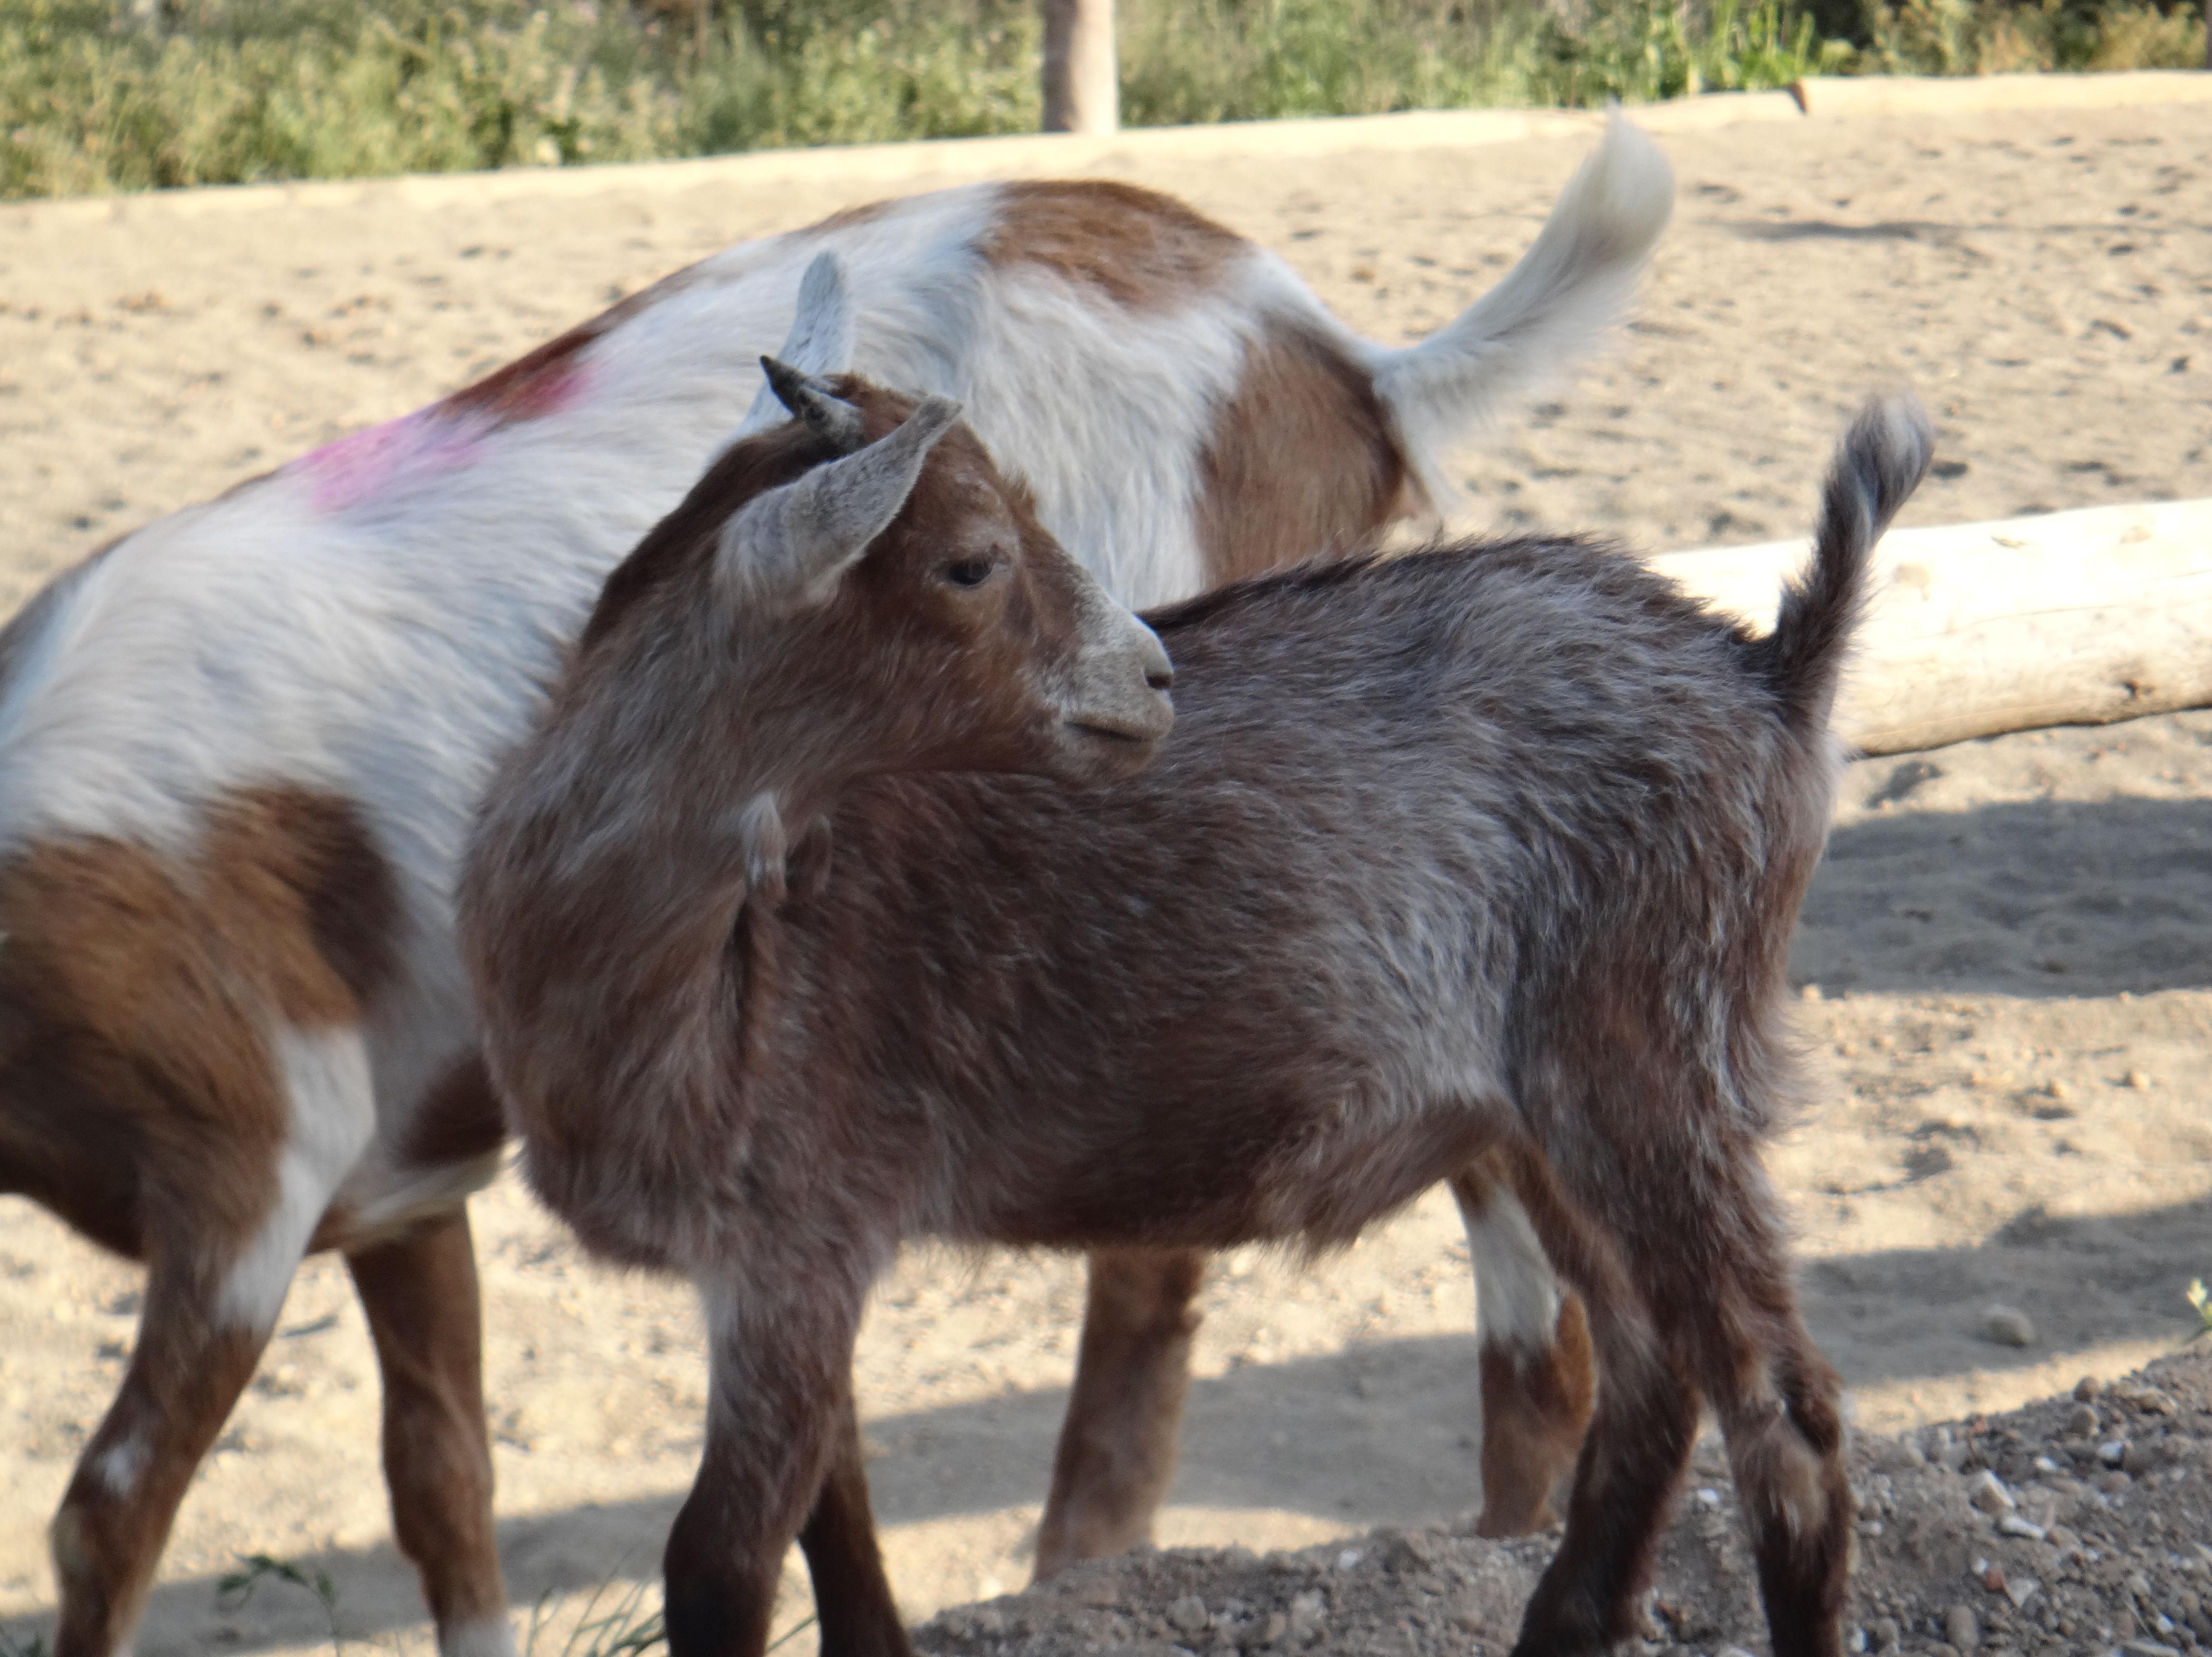 Foto 13 de Hípica y equitación en (Les Fonts) | Hípica Can Buimira